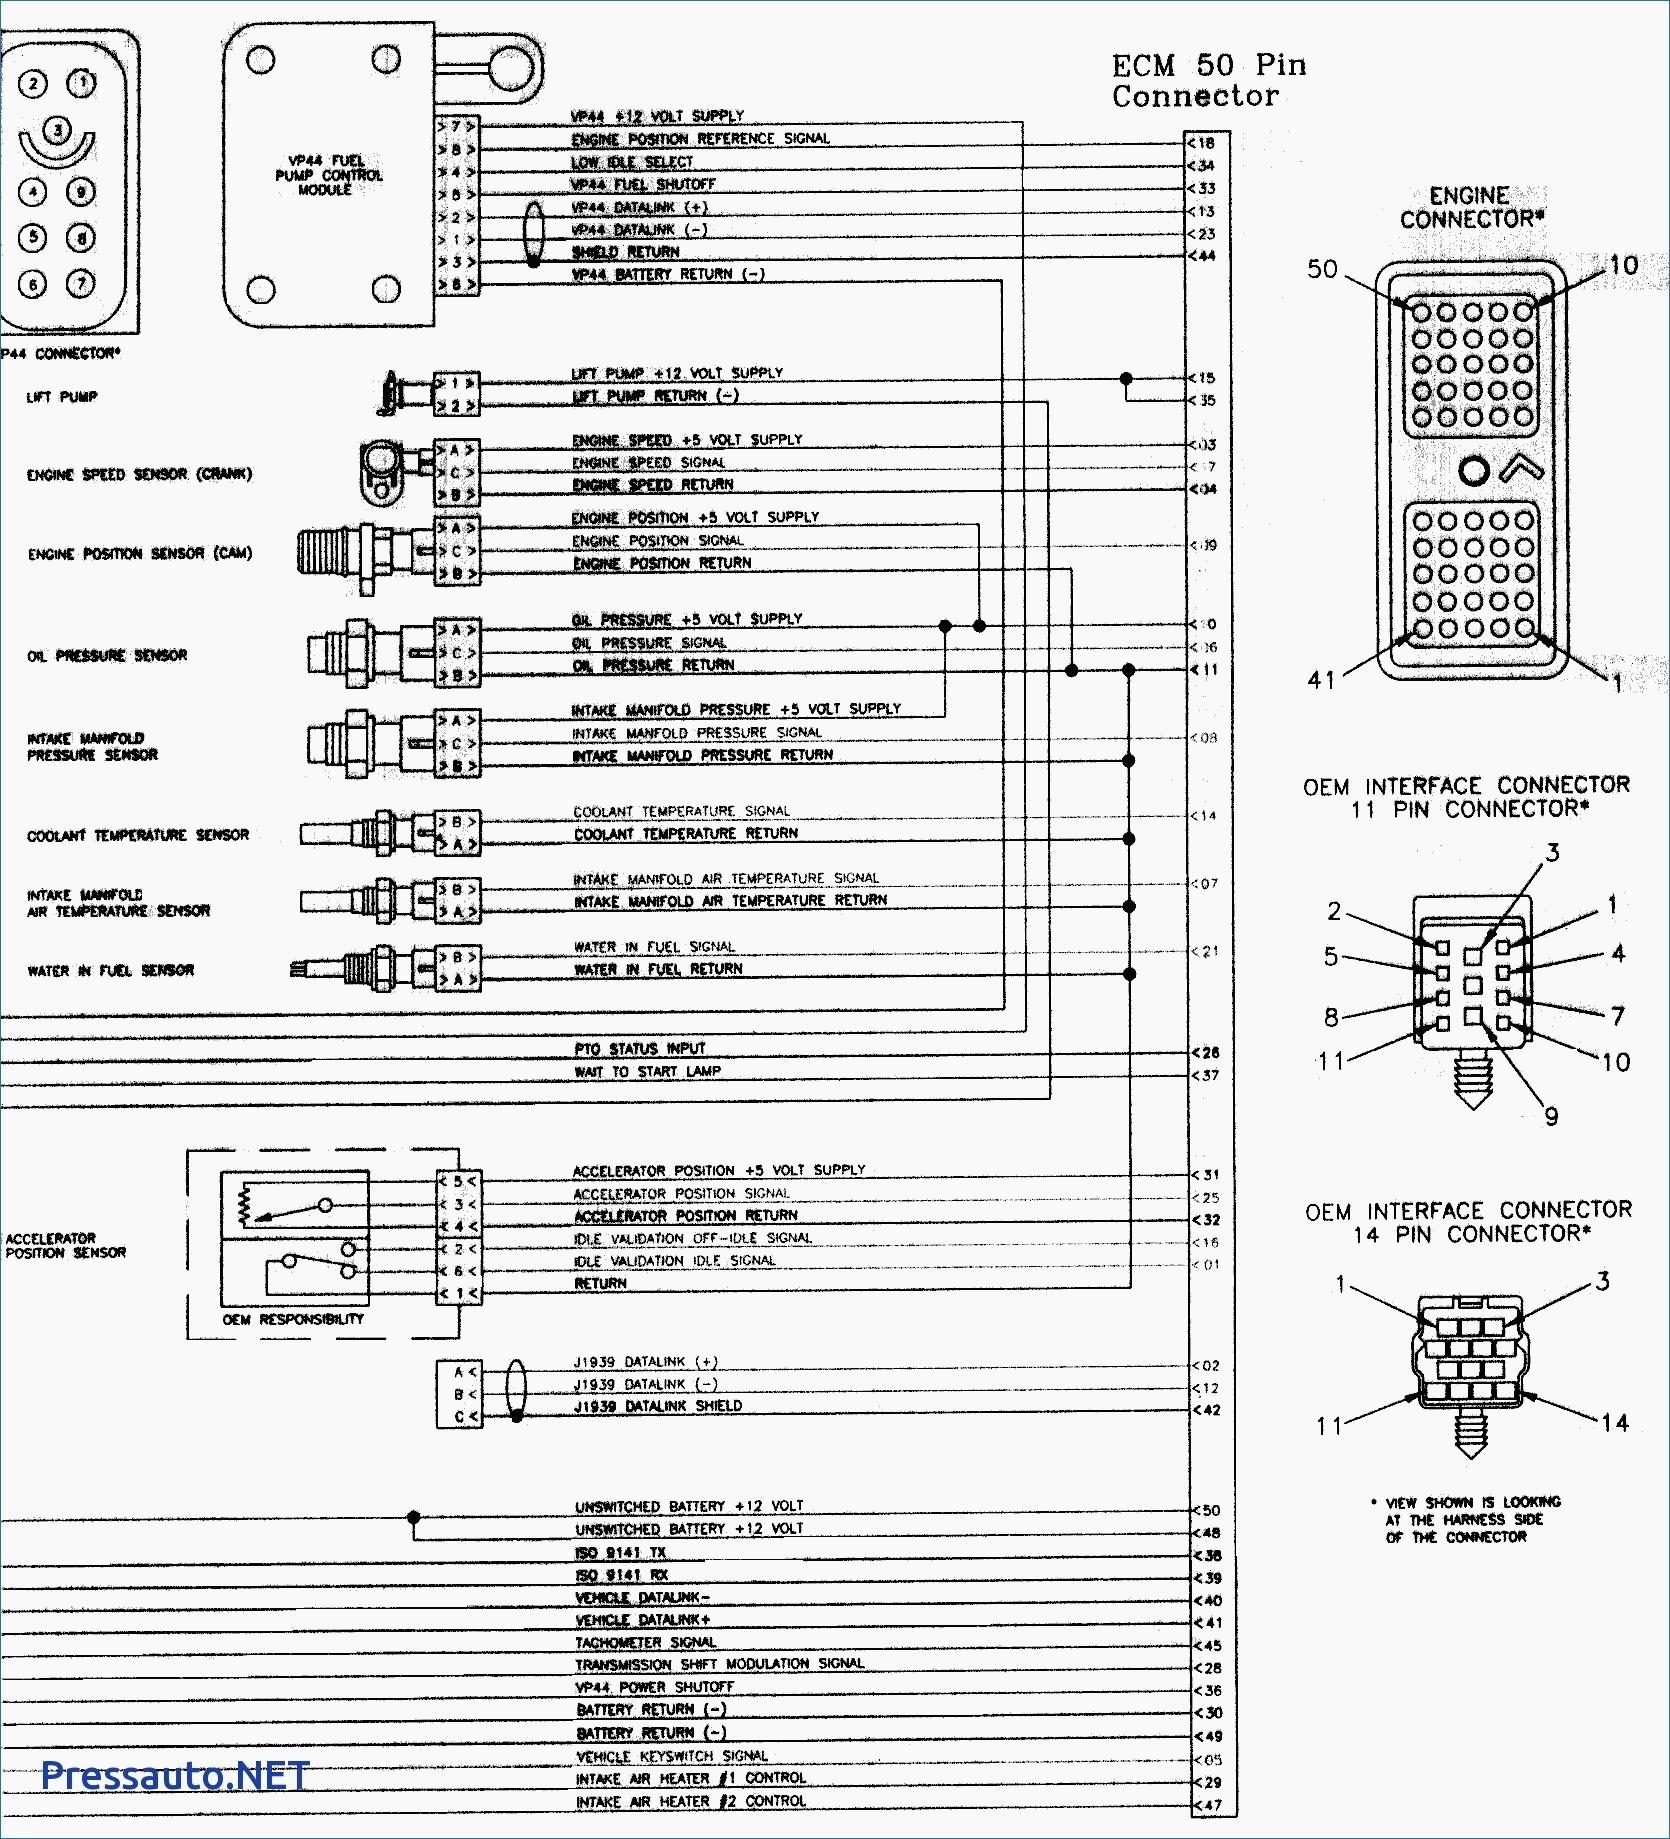 2002 dodge ram 1500 wiring diagram car starter motor 2001 pcm gallery